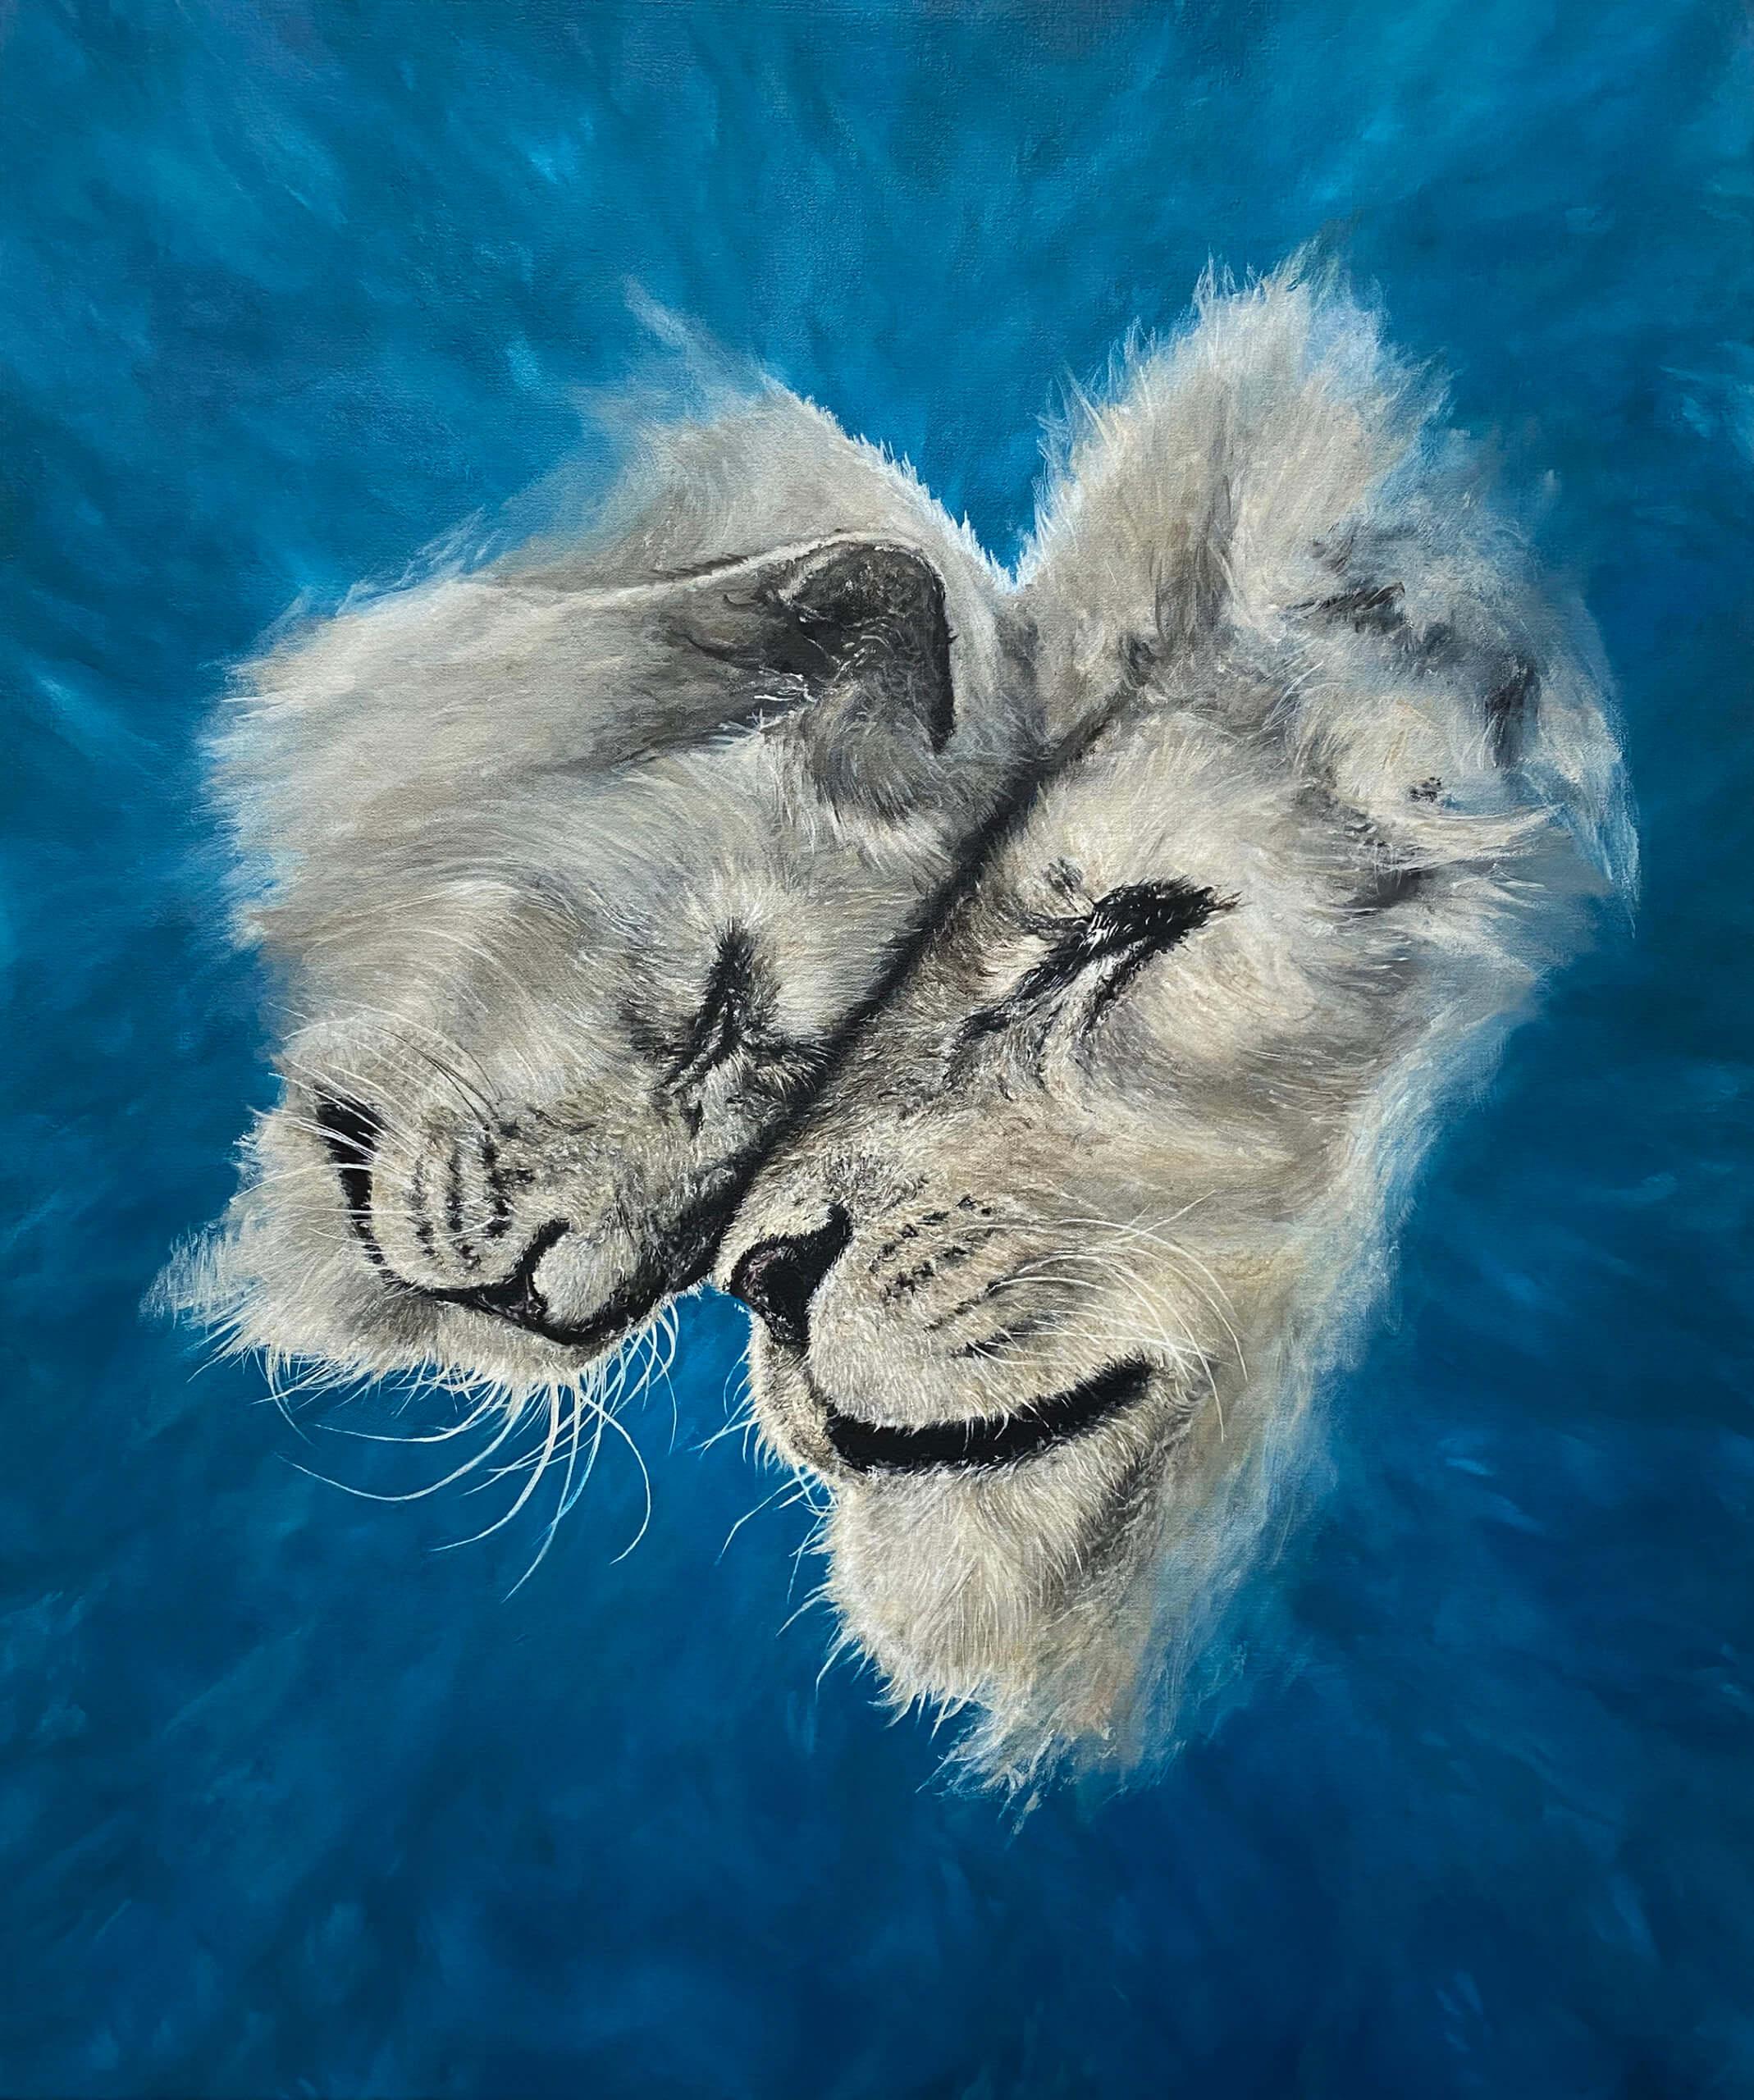 Brendan Lynch Love Cats (the cure), 2020 oil on canvas 30 x 25 in. (76.2 x 63.5 cm.)